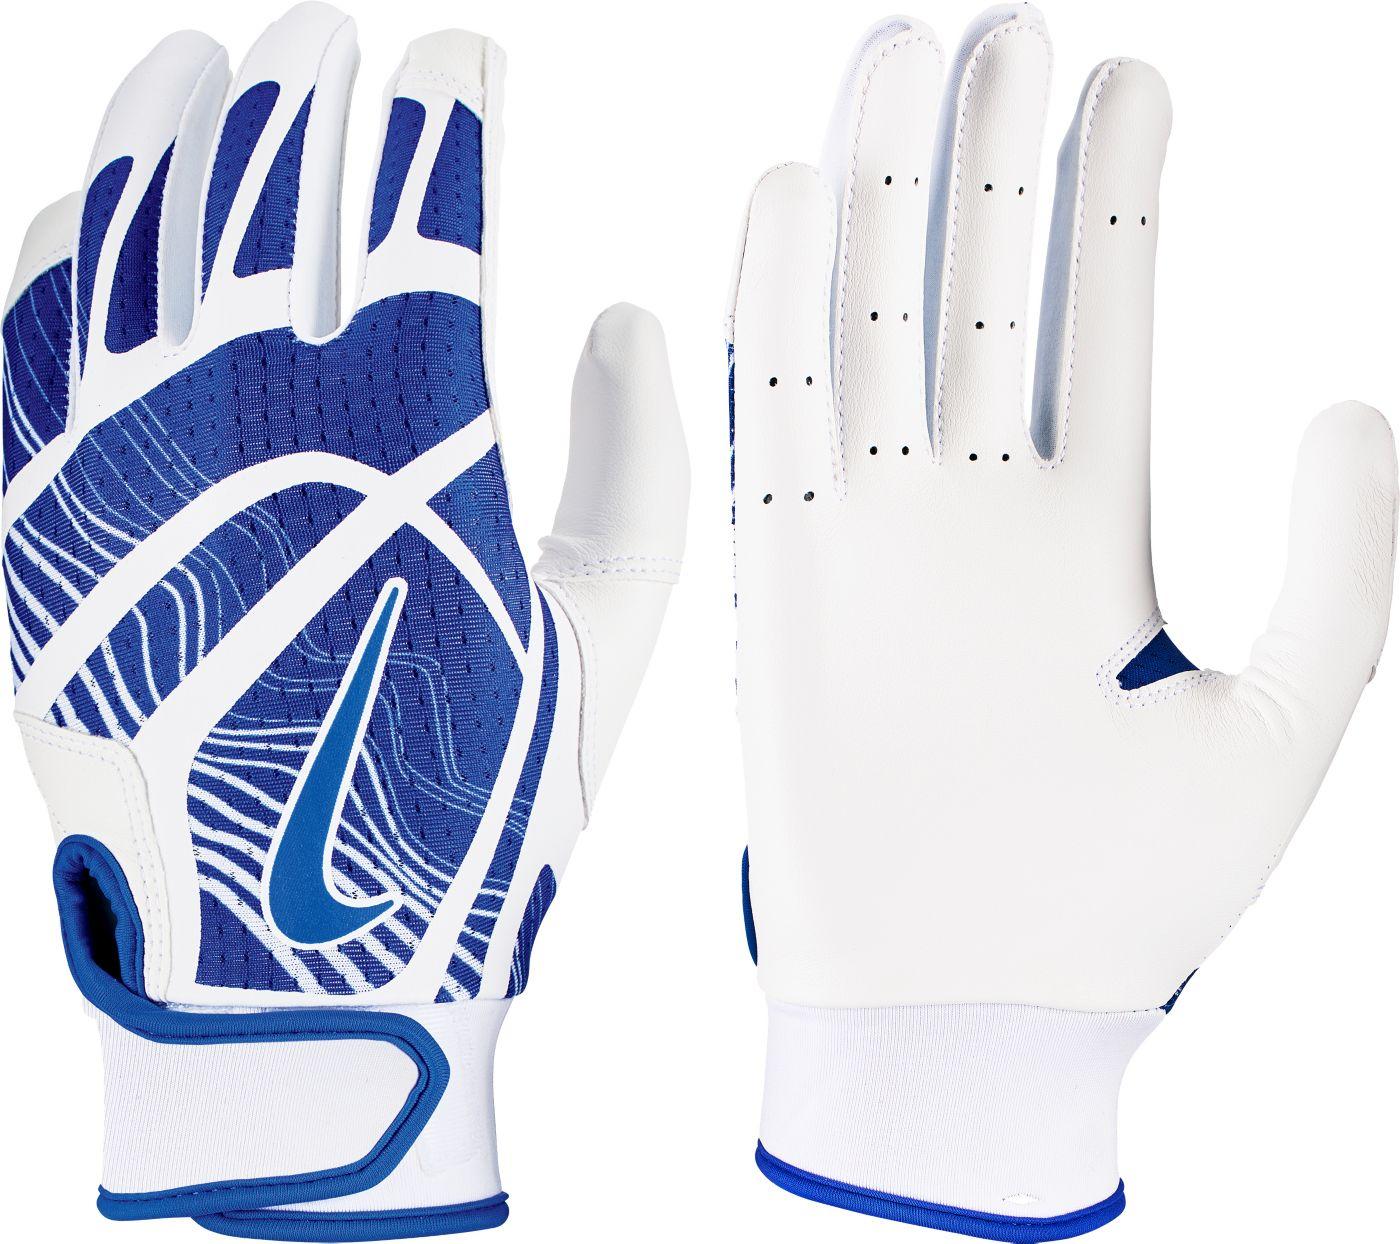 Nike Women's Hyperdiamond Edge Fastpitch Batting Gloves 2020